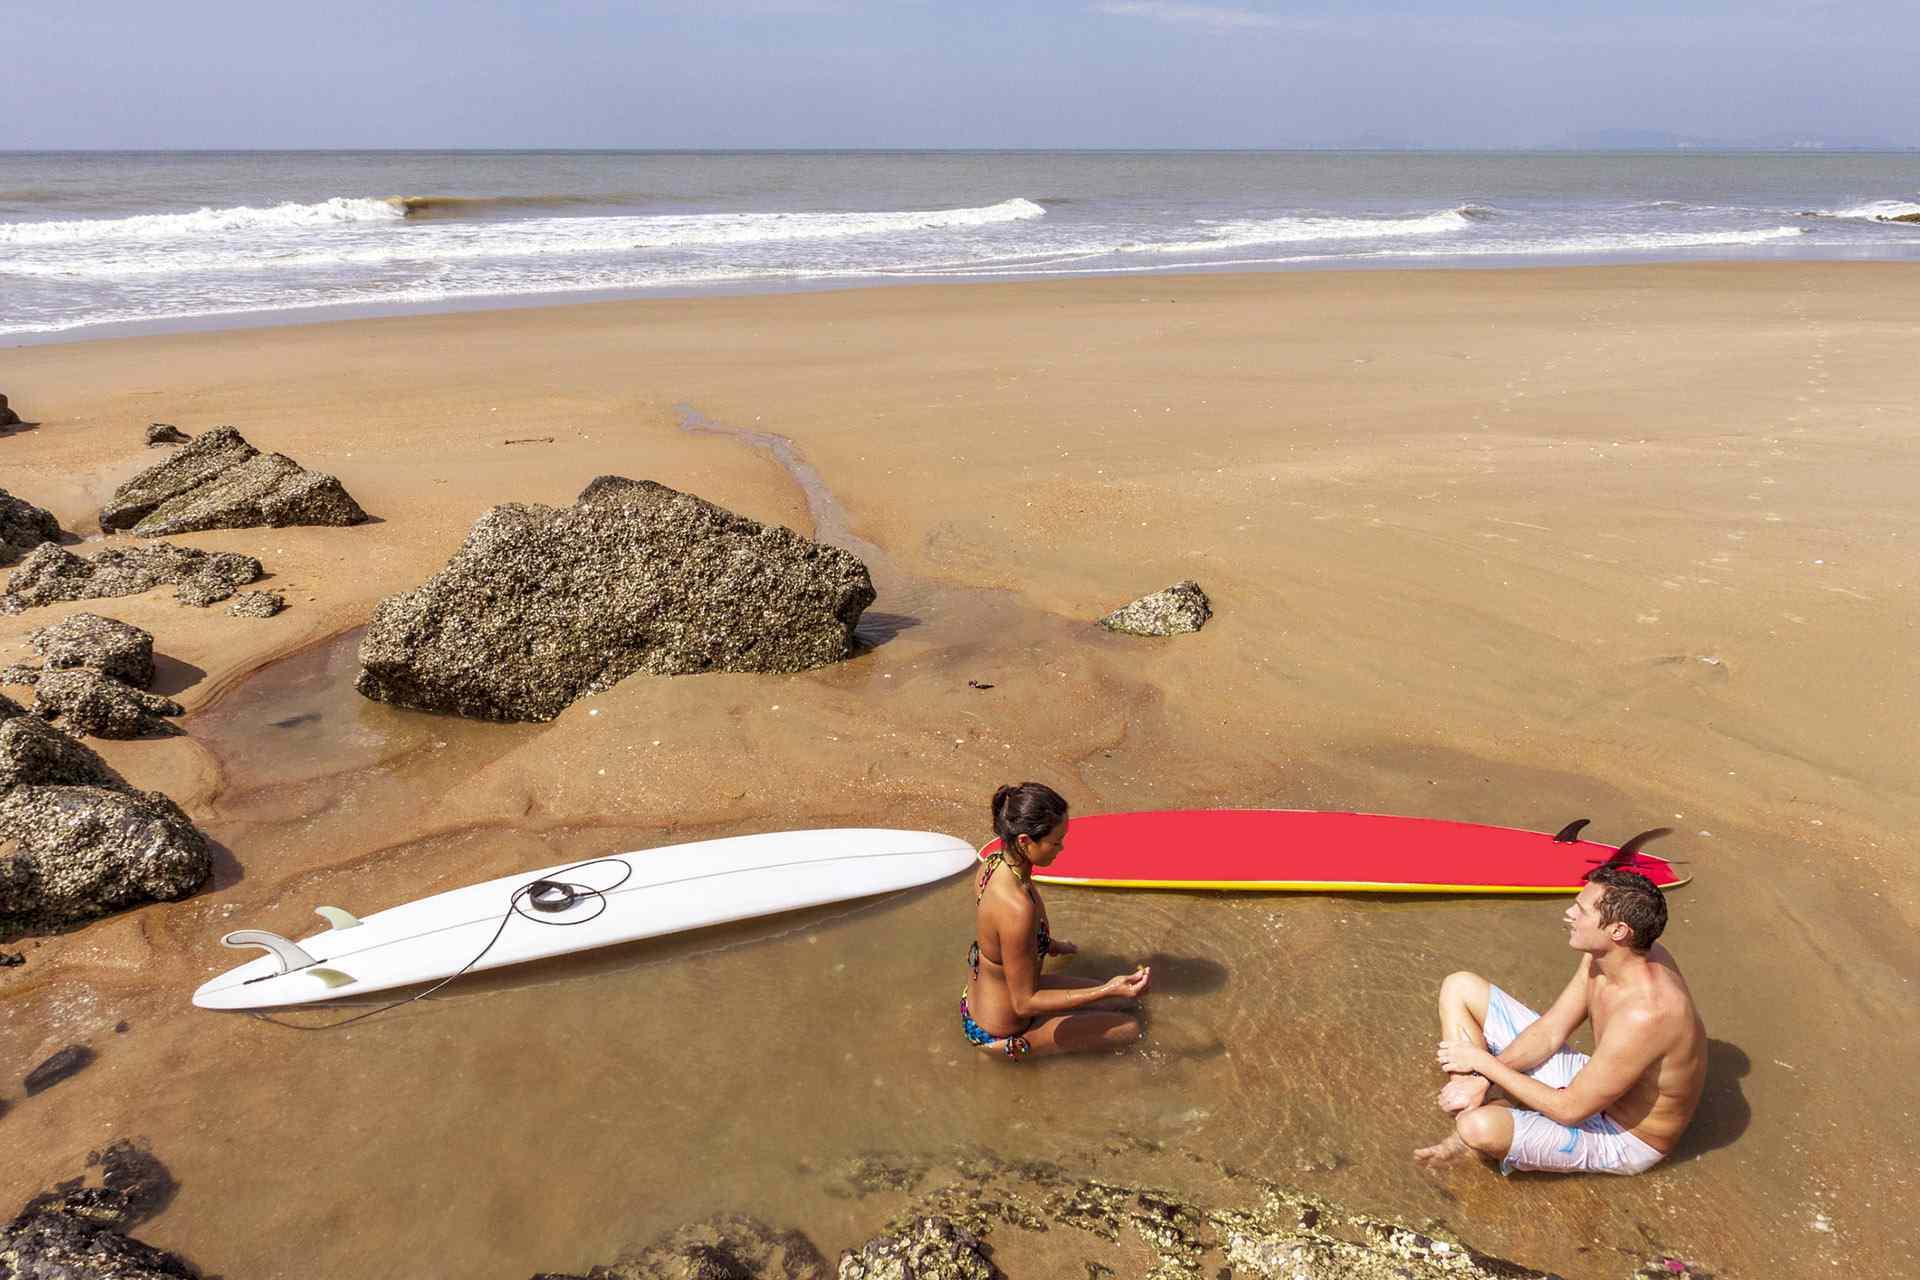 Surfers chilling on Vung Tau, Vietnam